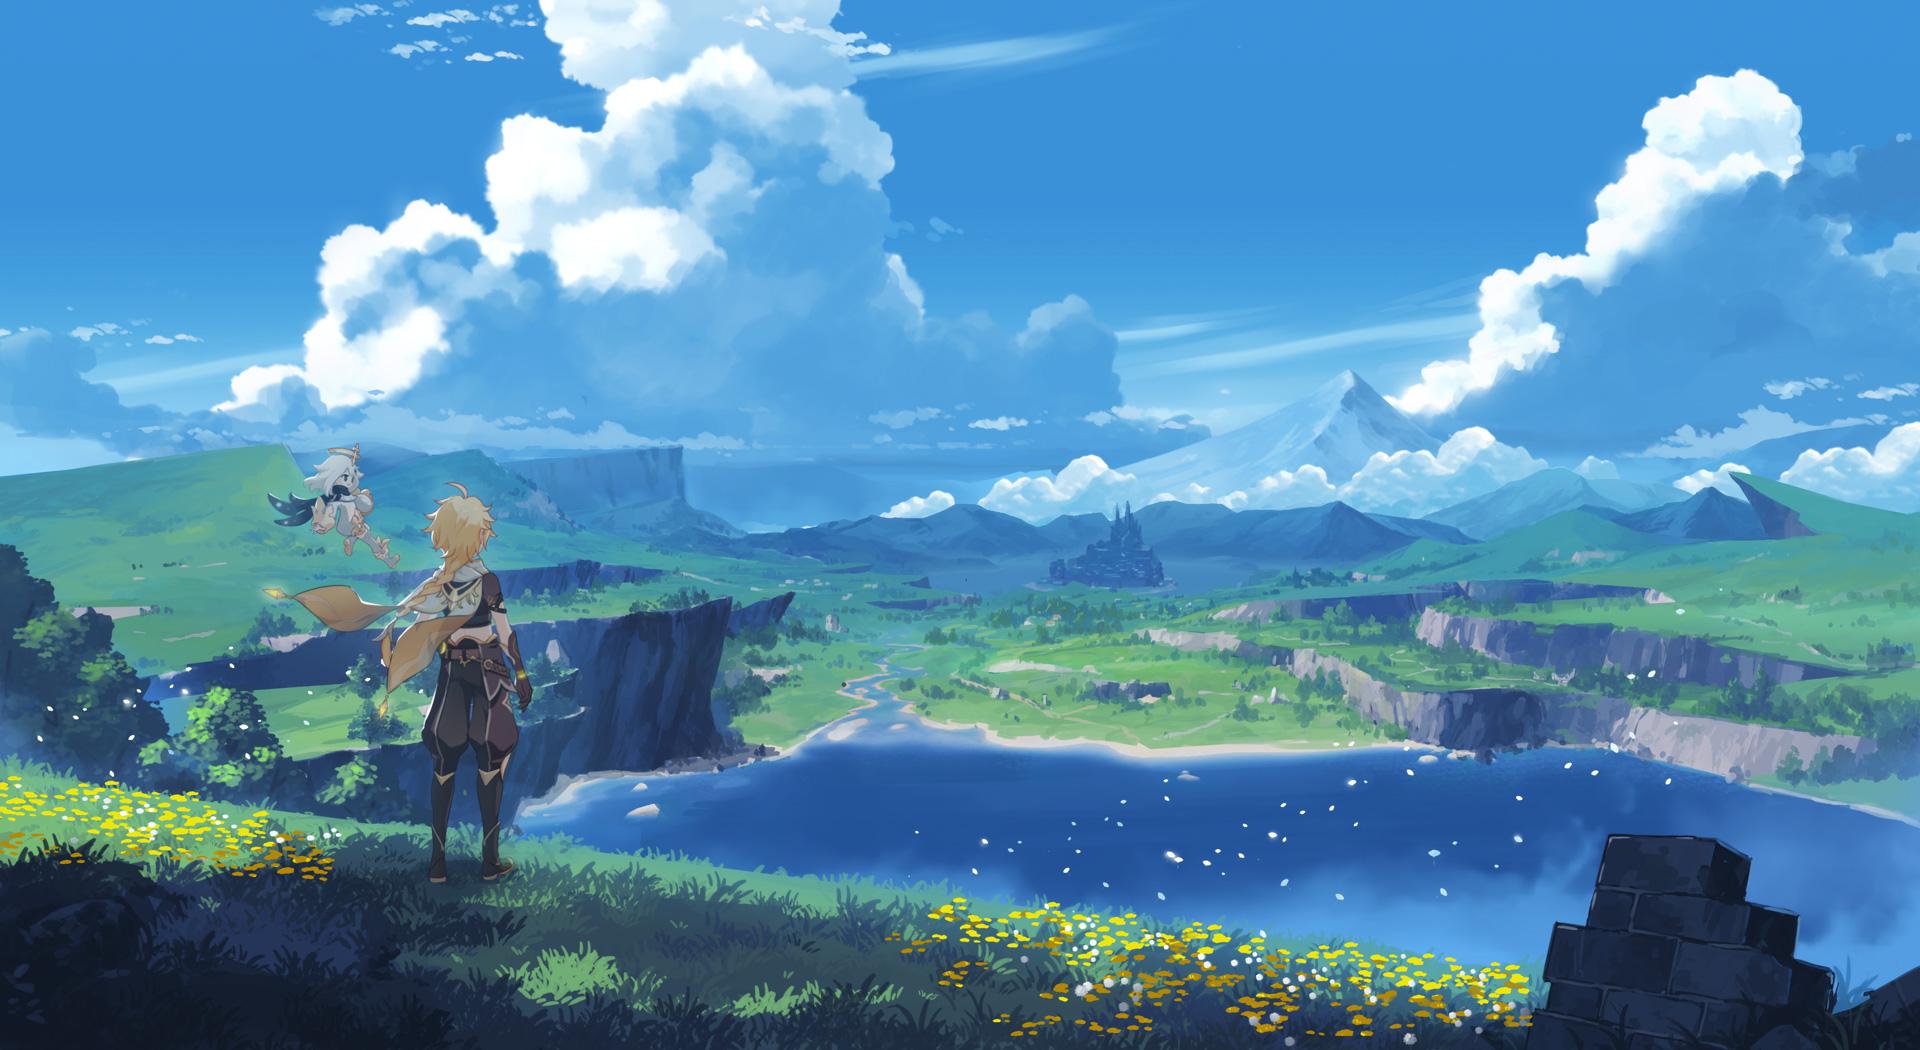 Zelda Lookalike Genshin Impact Is Heading To The Nintendo Switch South China Morning Post